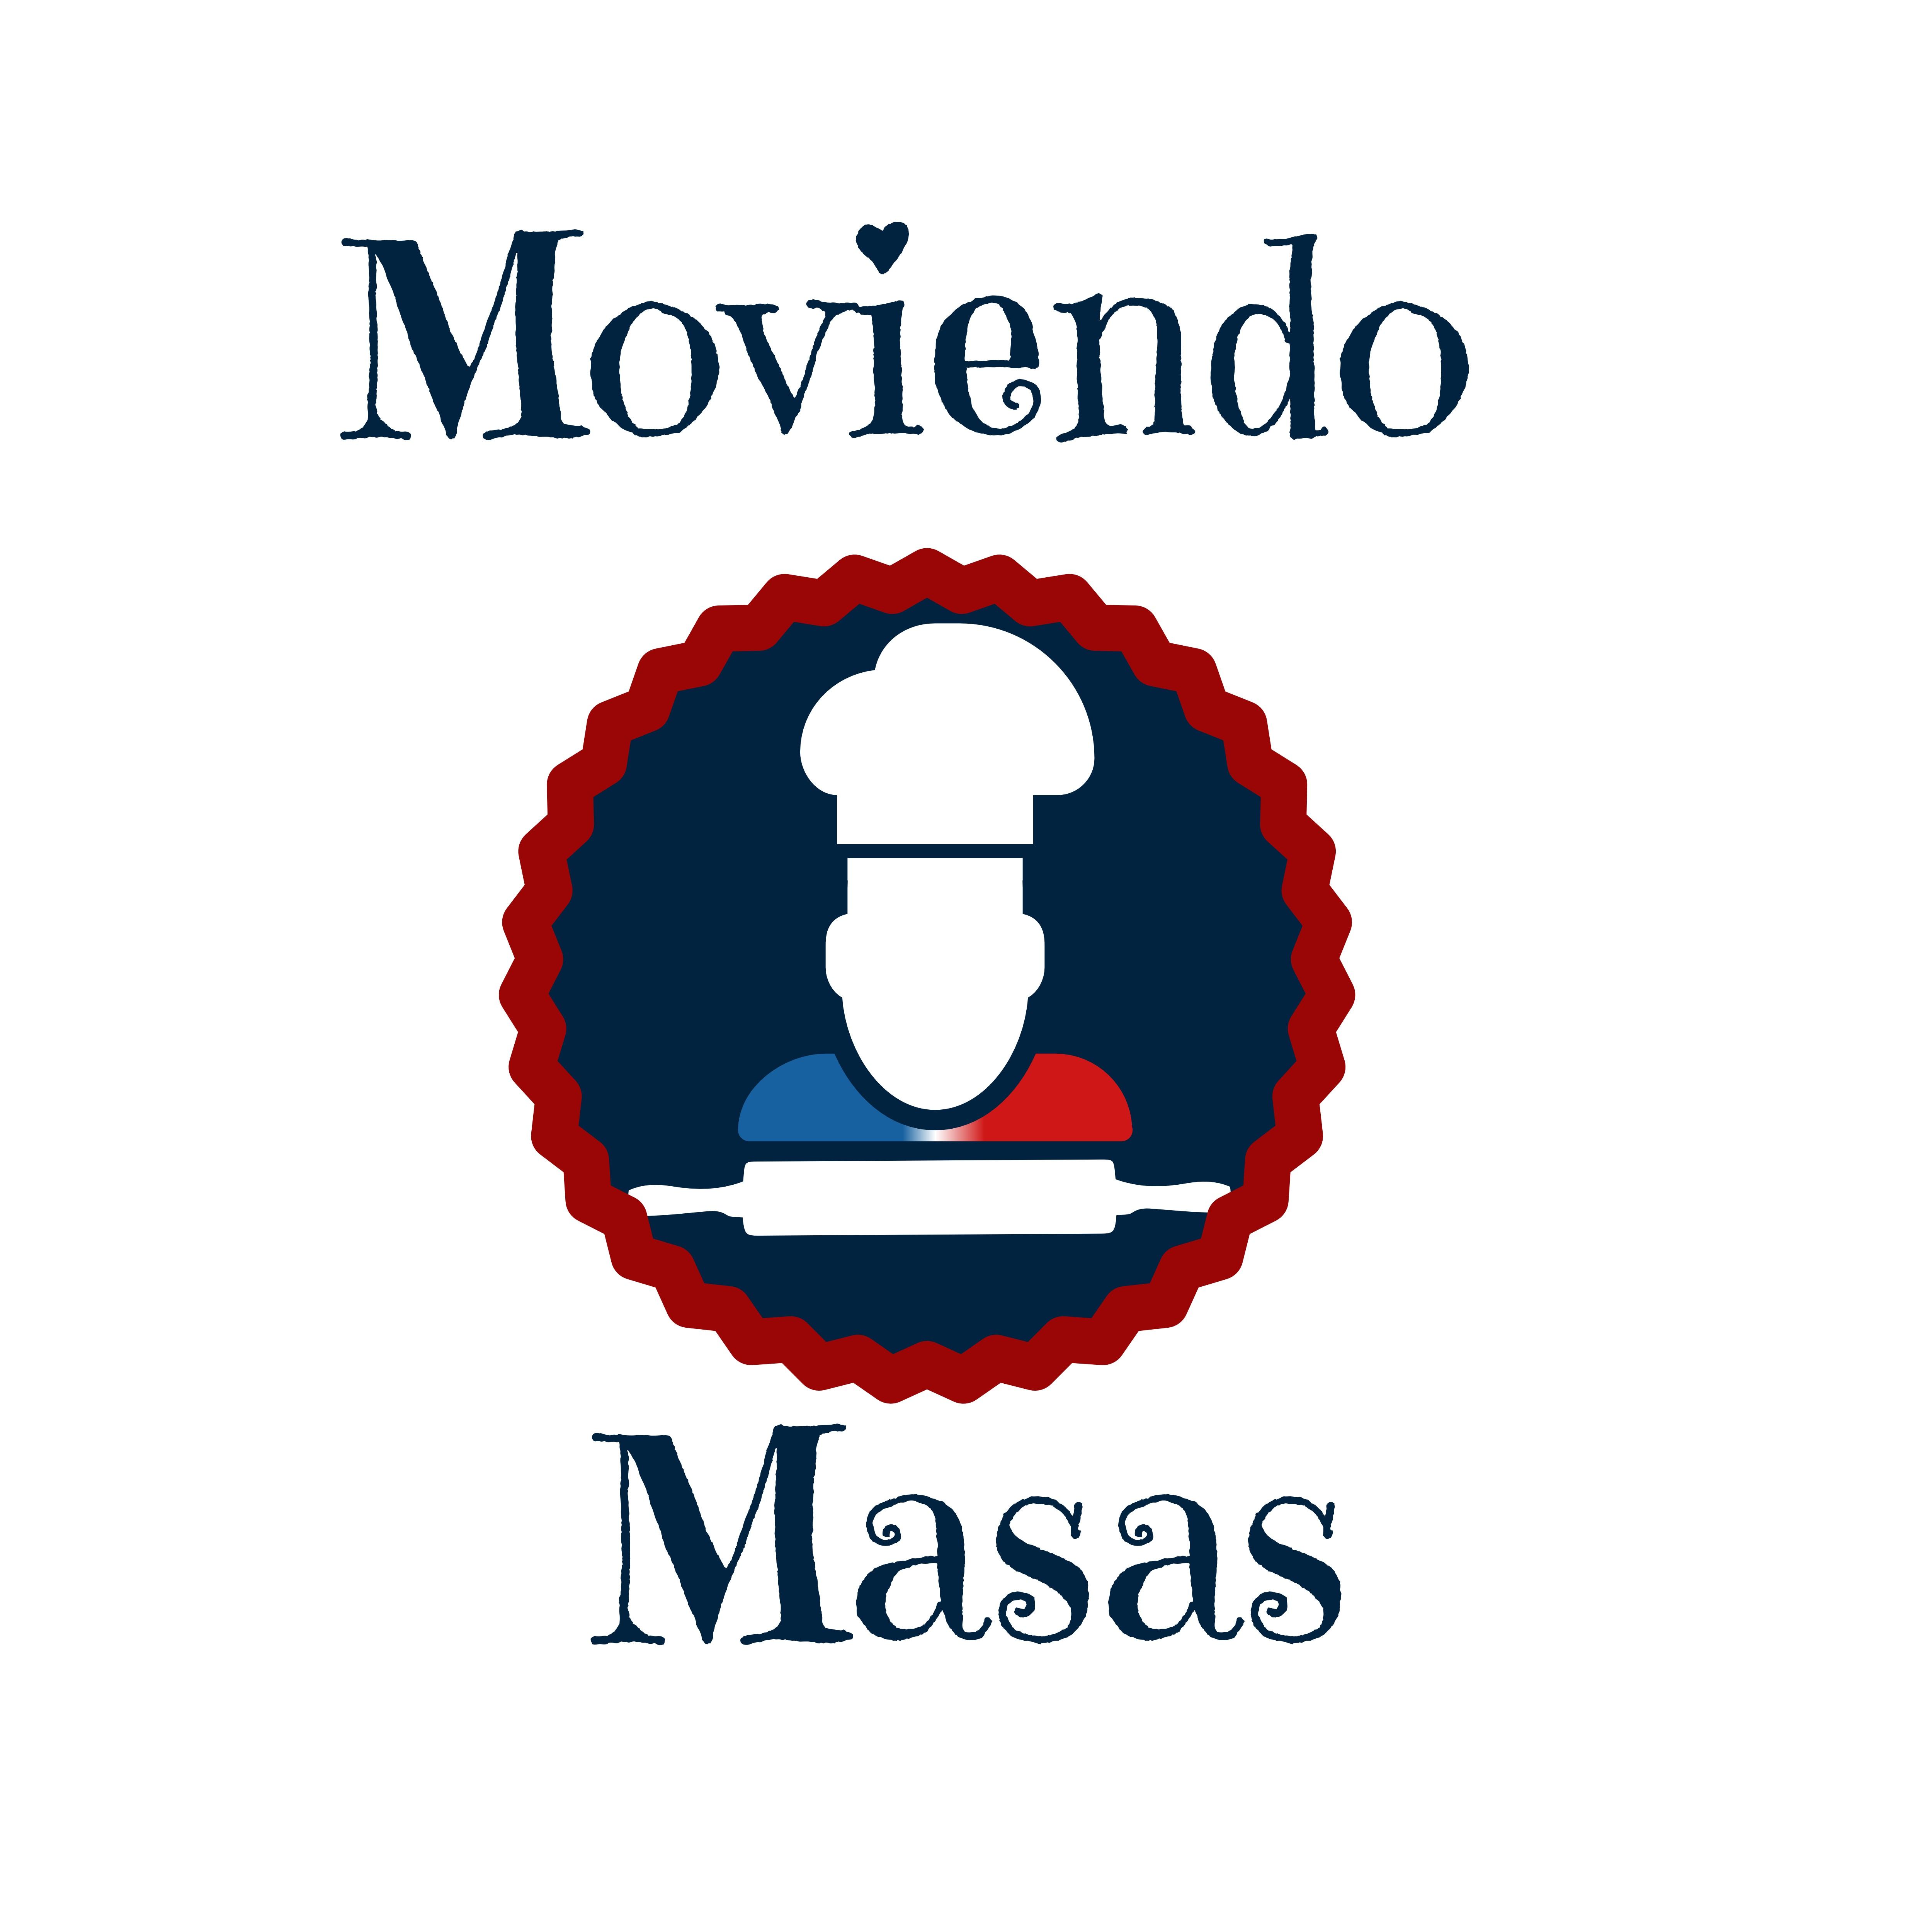 MOVIENDO MASAS SpA